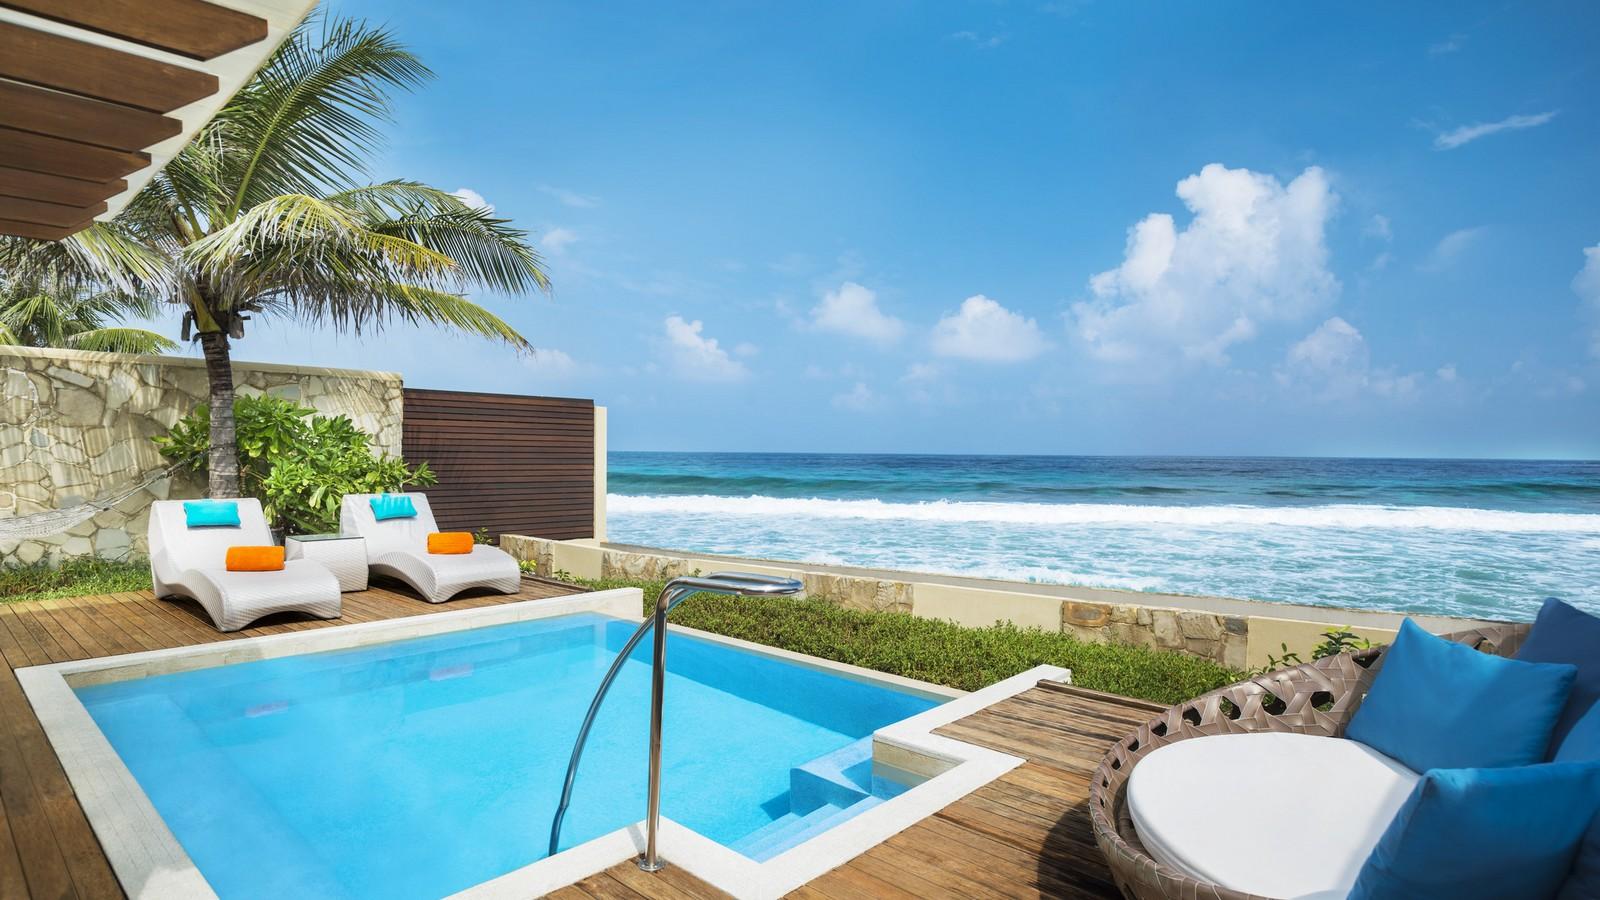 maldives luxury resort   guest rooms at sheraton maldives   luxury